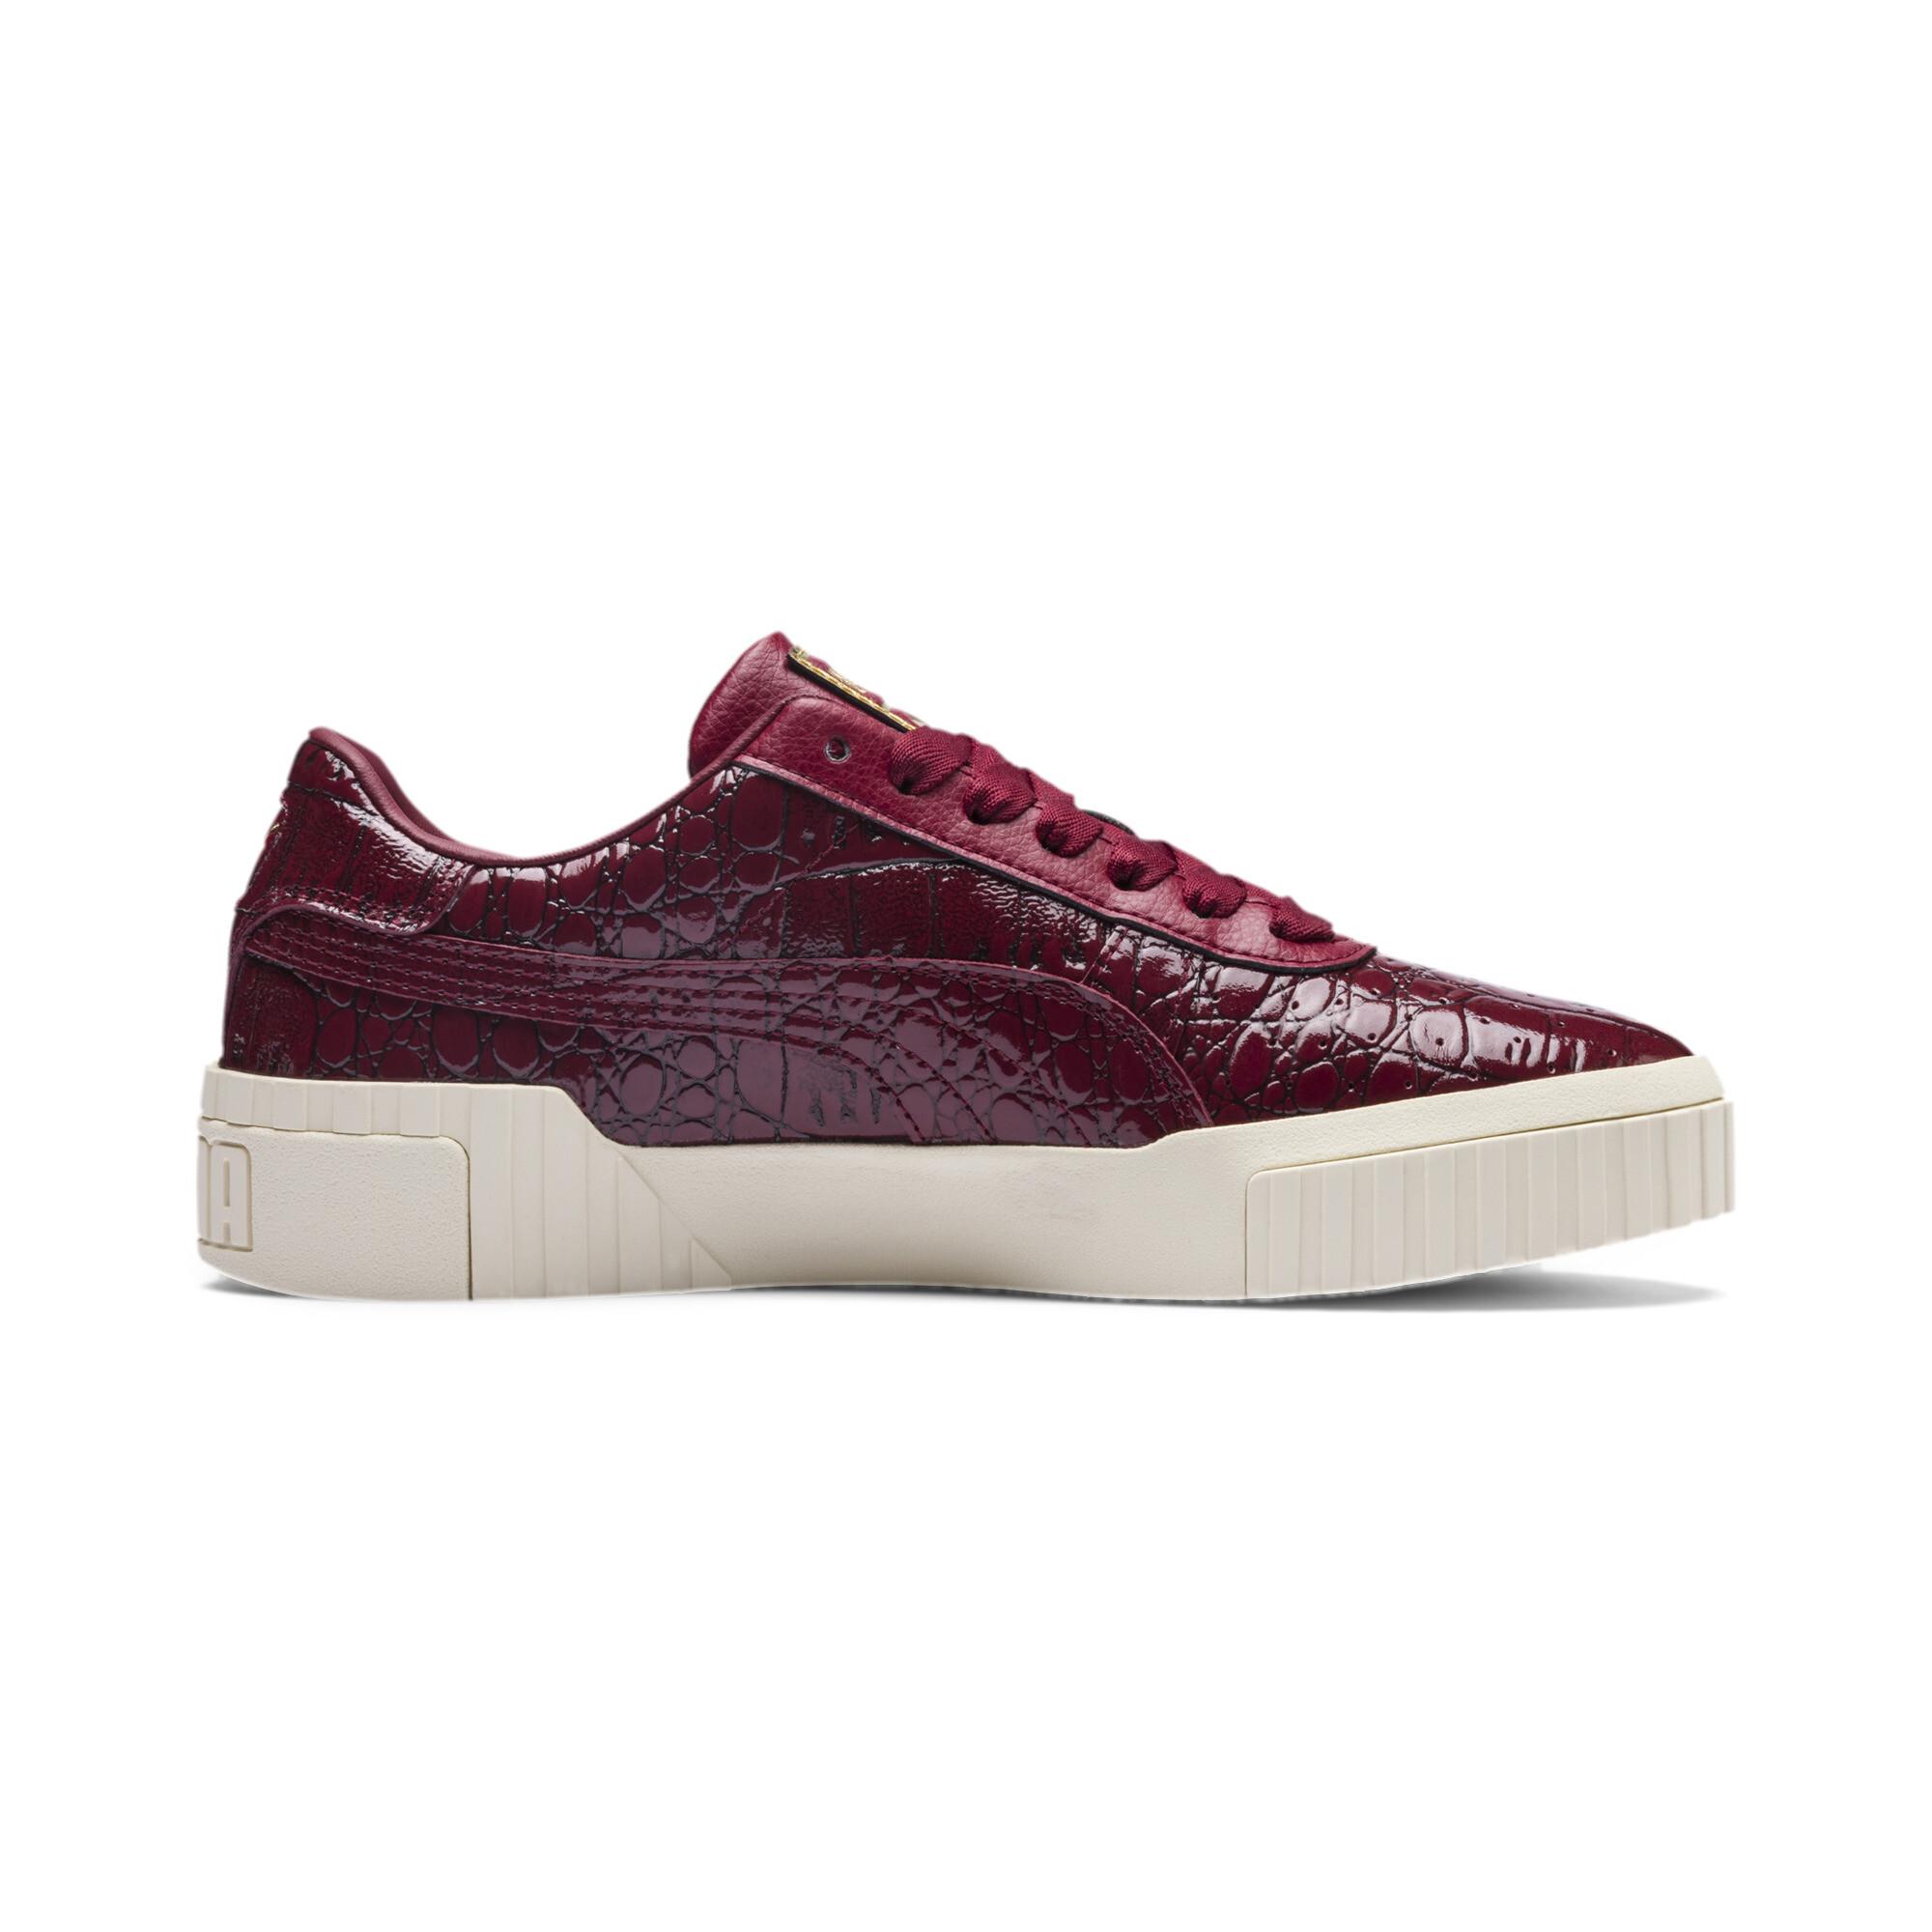 Image Puma Cali Croc Women's Sneakers #6